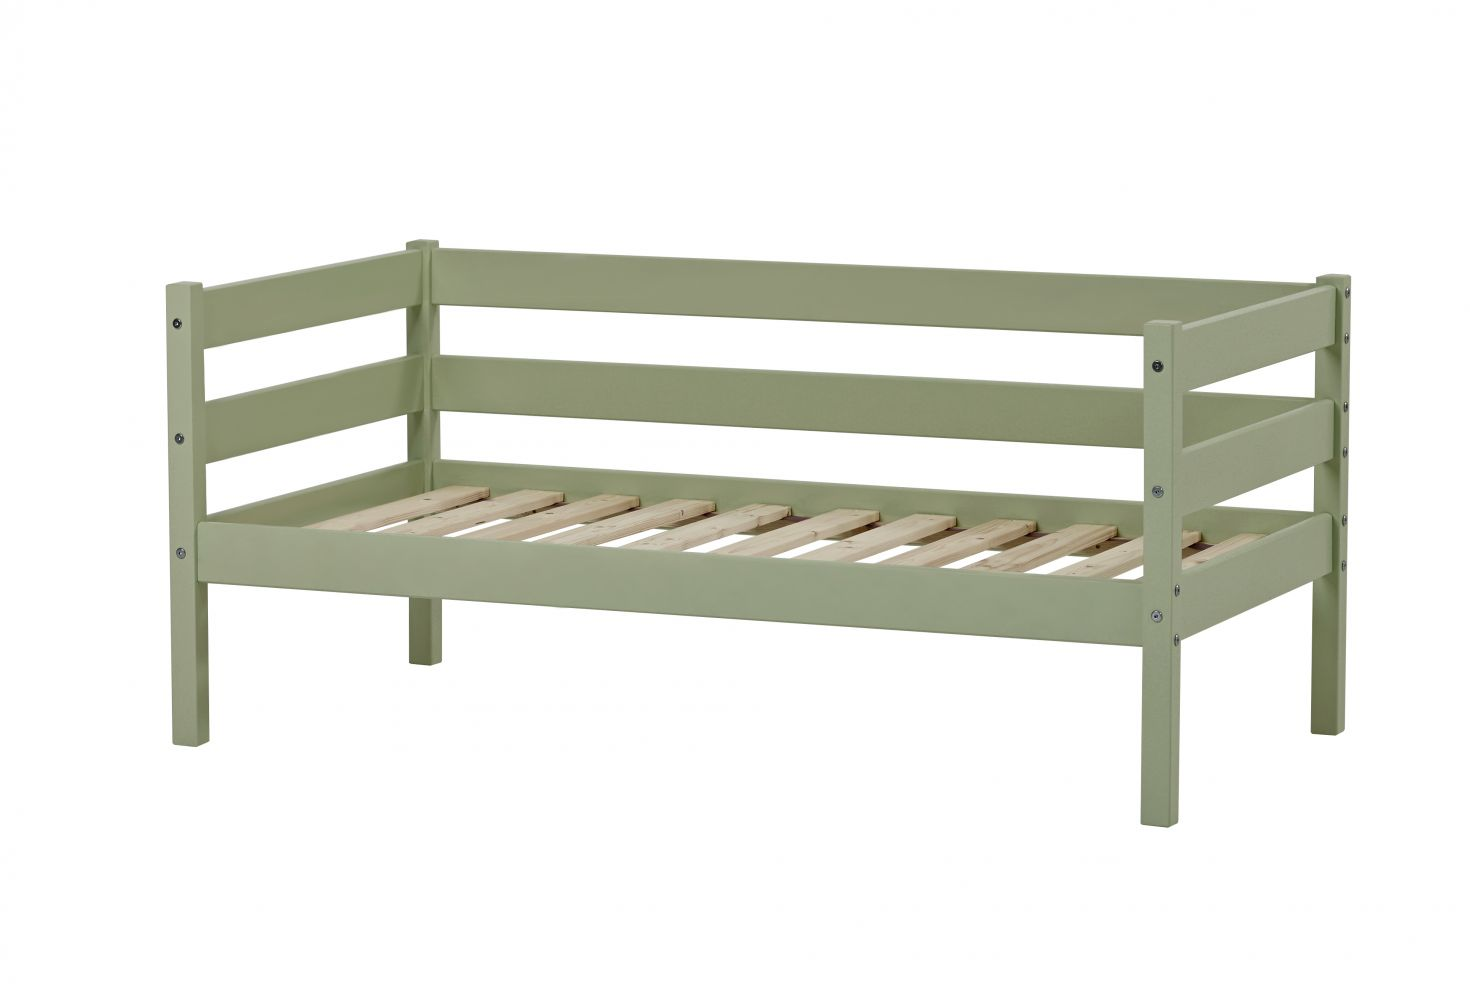 Hoppekids 'Ida-Marie' Einzelbett, pale green, Kiefer massiv, inkl. Rolllattenrost, 70x160cm, nachhaltig Bild 1